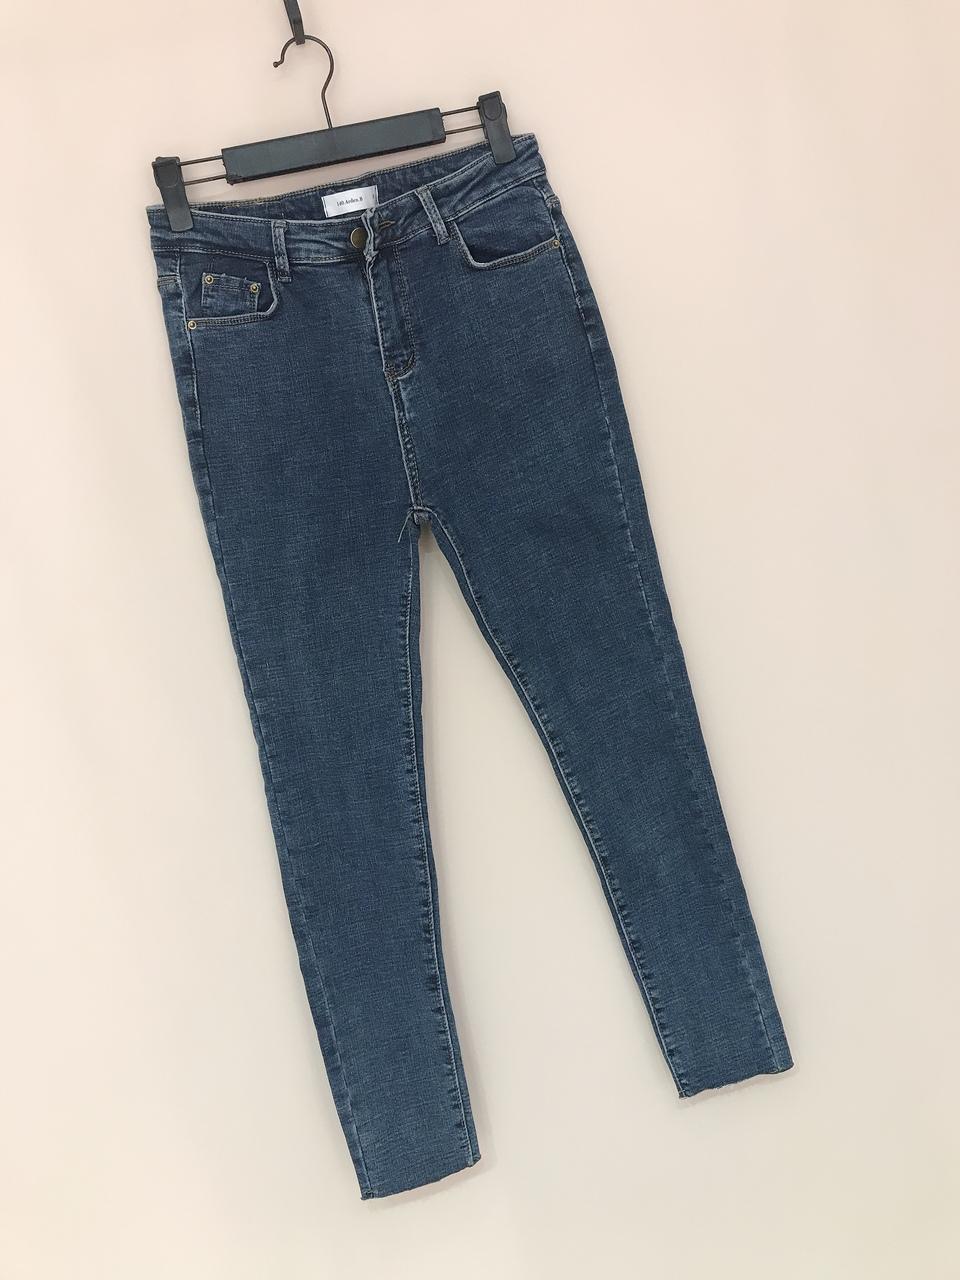 Plush high elastic smoke grey jeans women 2020 9-inch spring autumn pencil pants small leg jeans womens raw edge